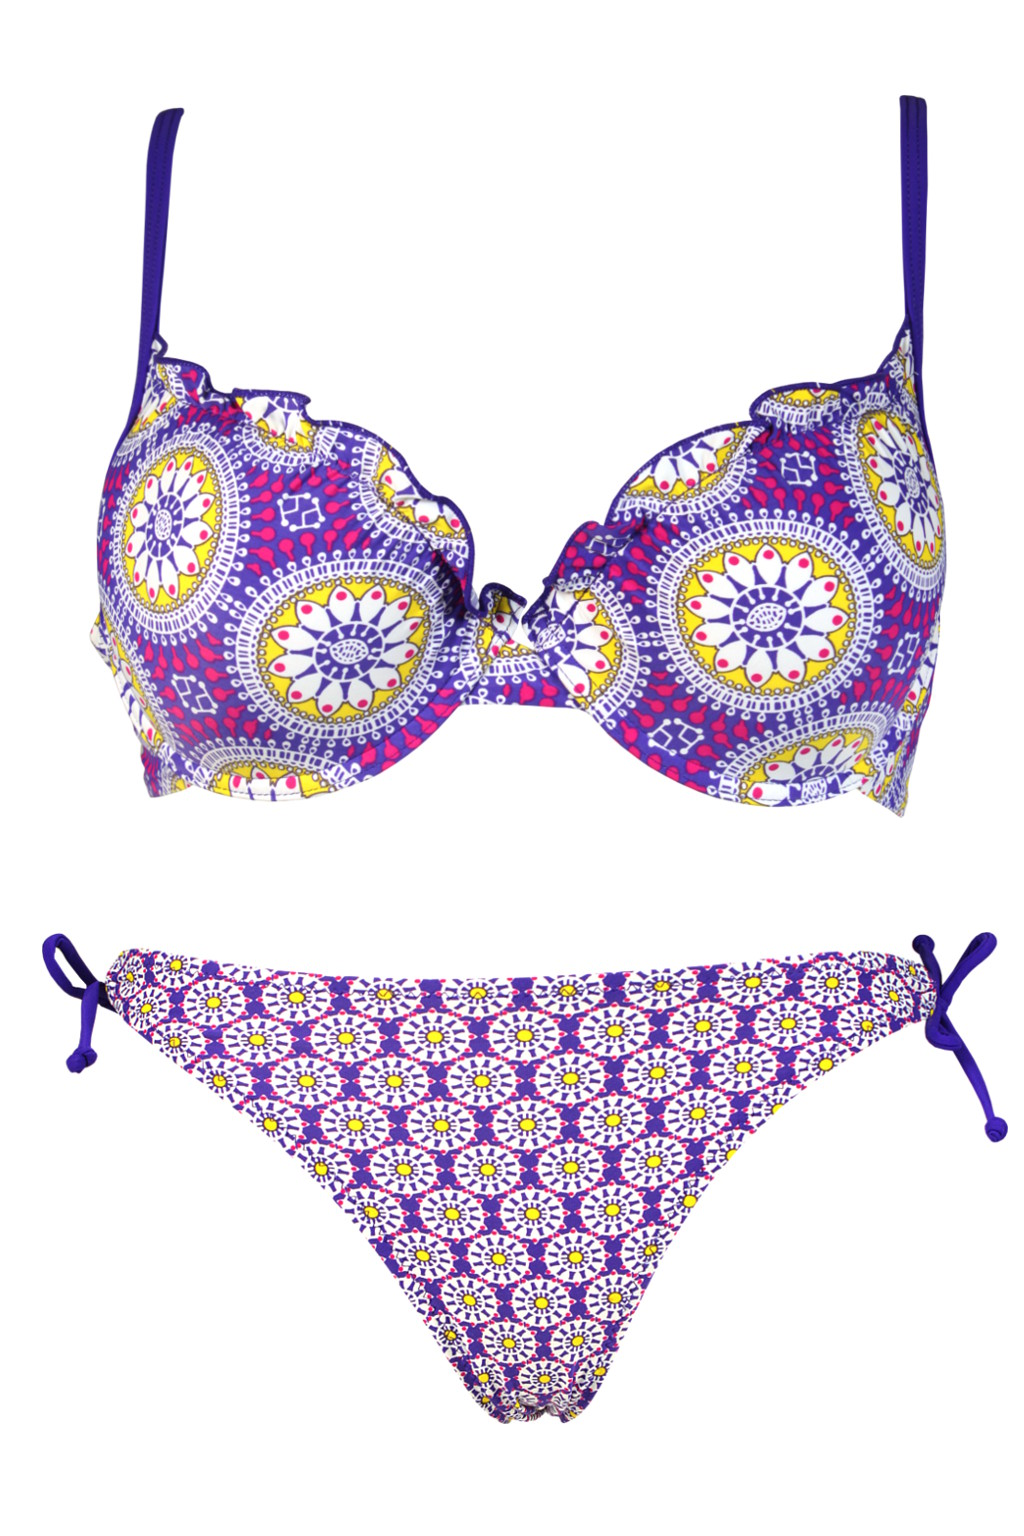 Briane Sun II. dvojdílné plavky s kosticí L fialová